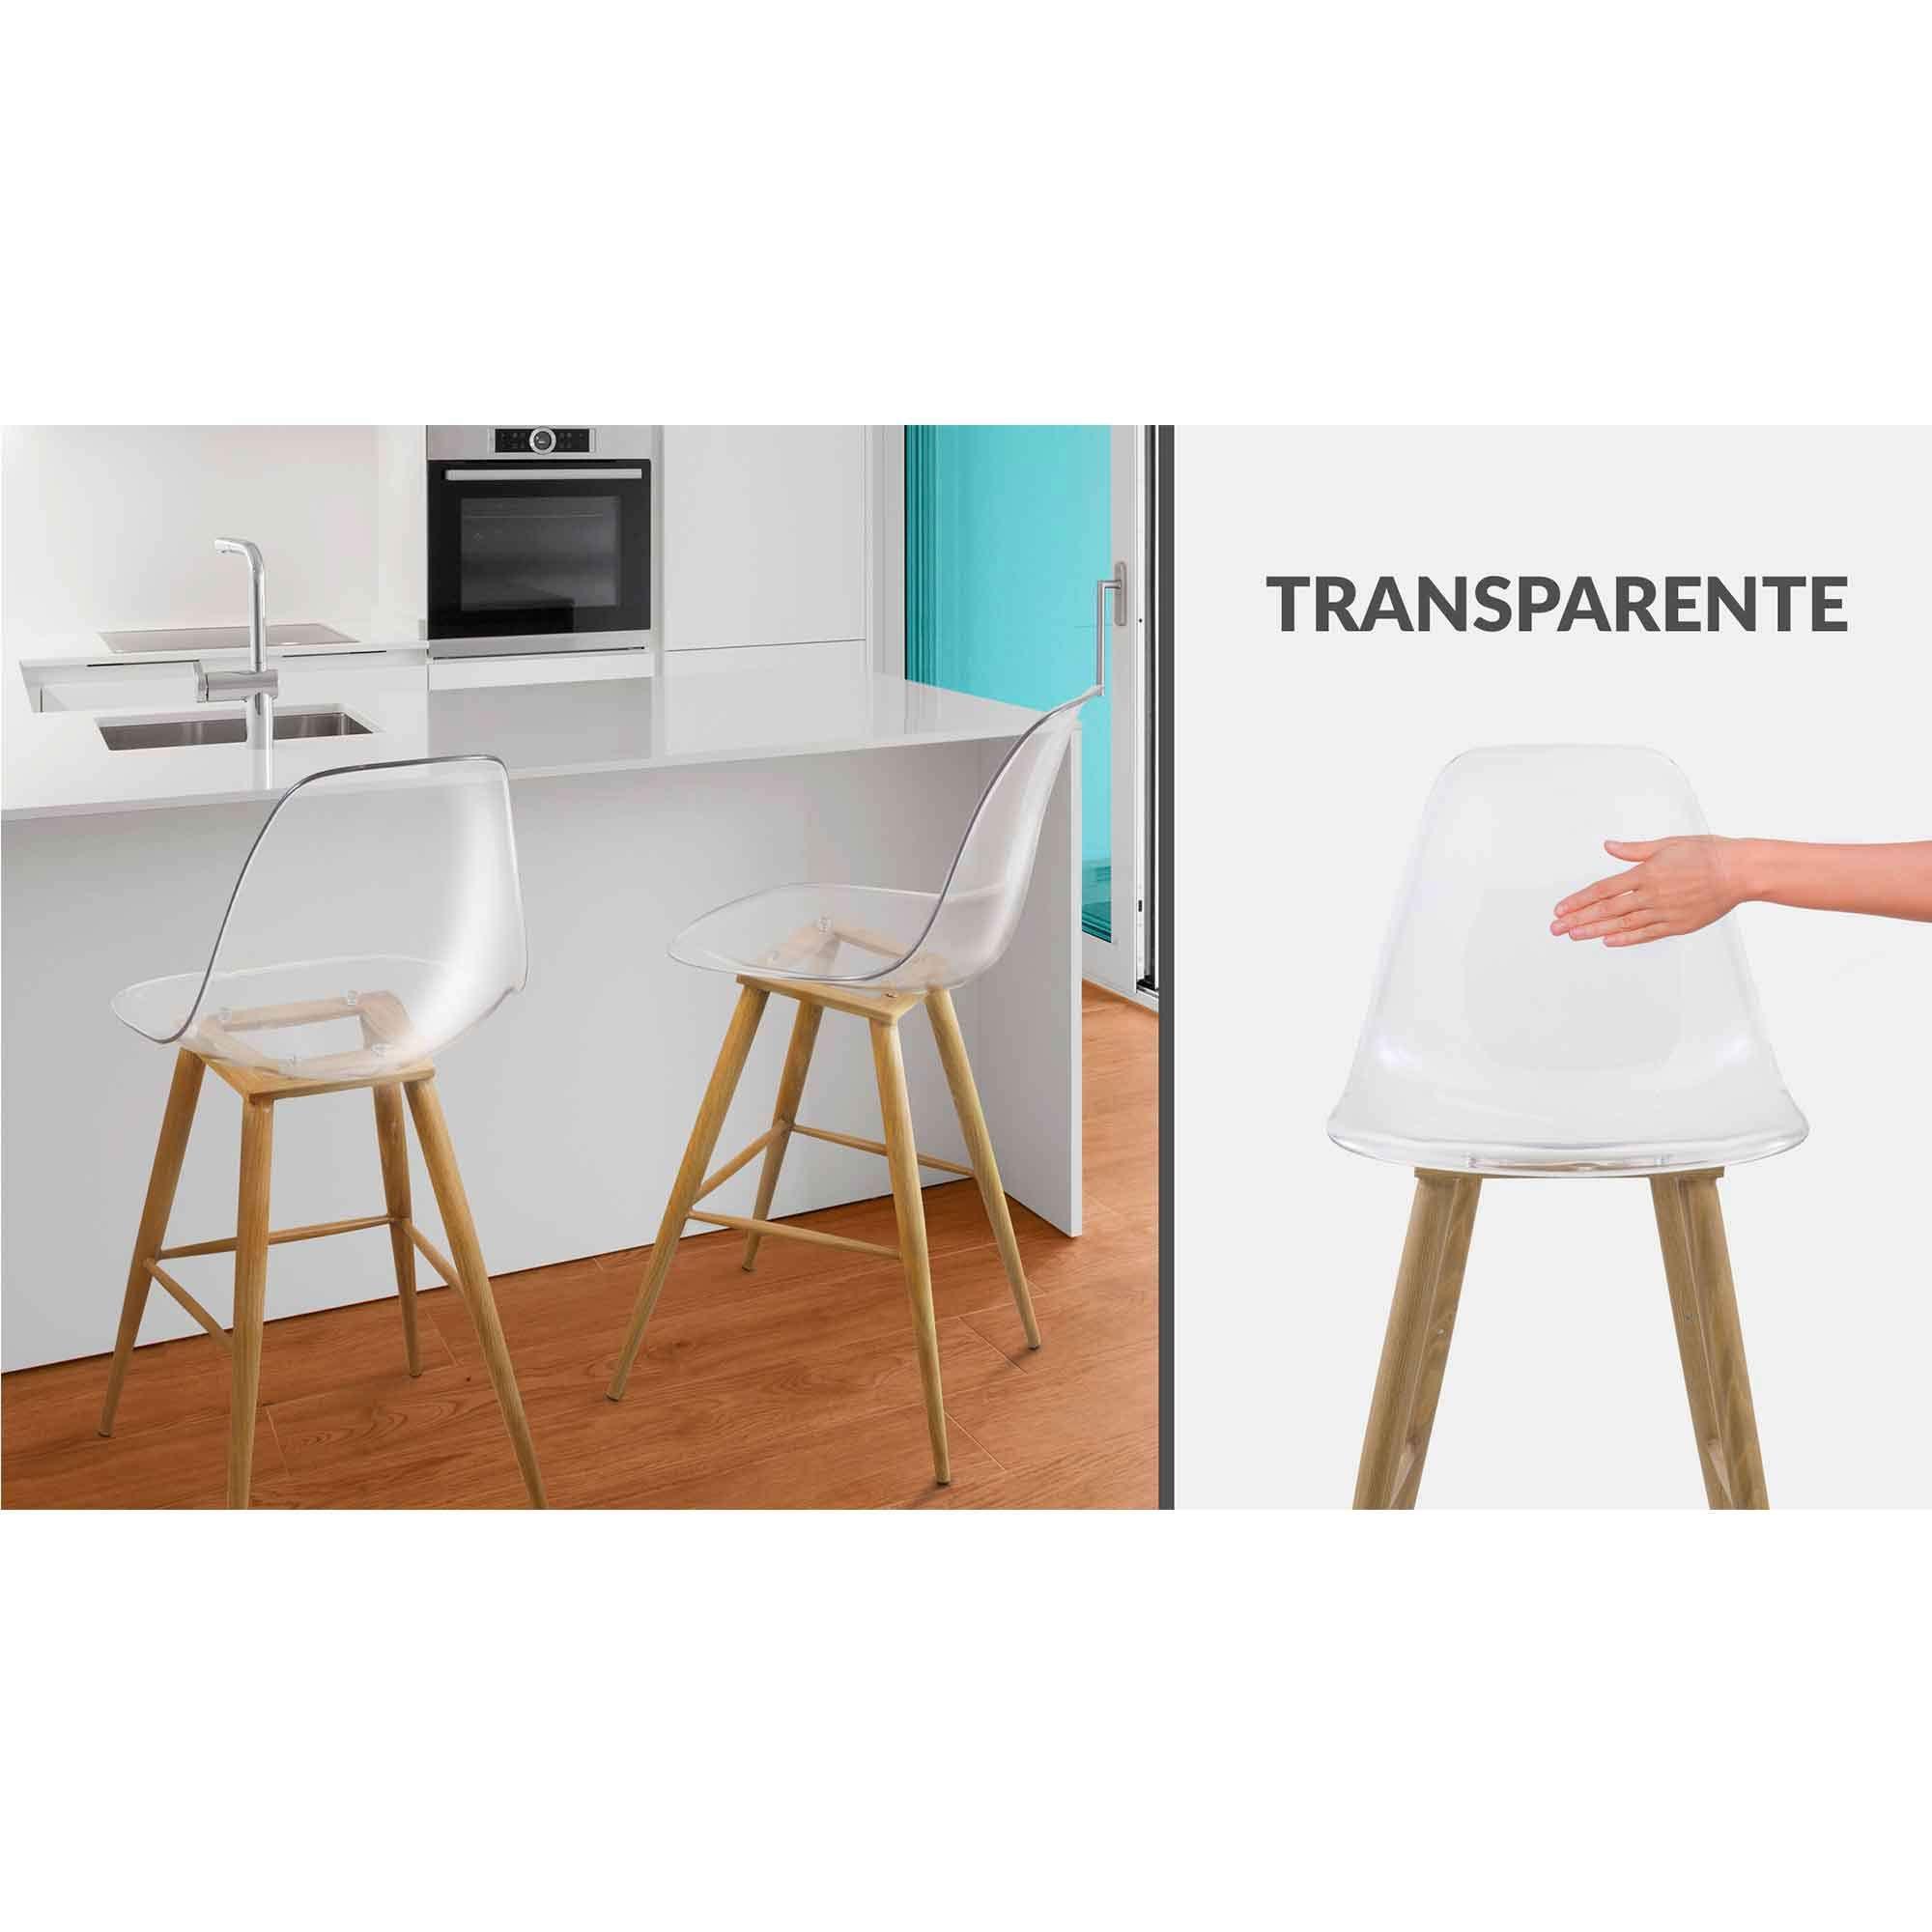 f54f9bb6a7833688d05503174a7a272b Impressionnant De Tabouret Bar Transparent Schème